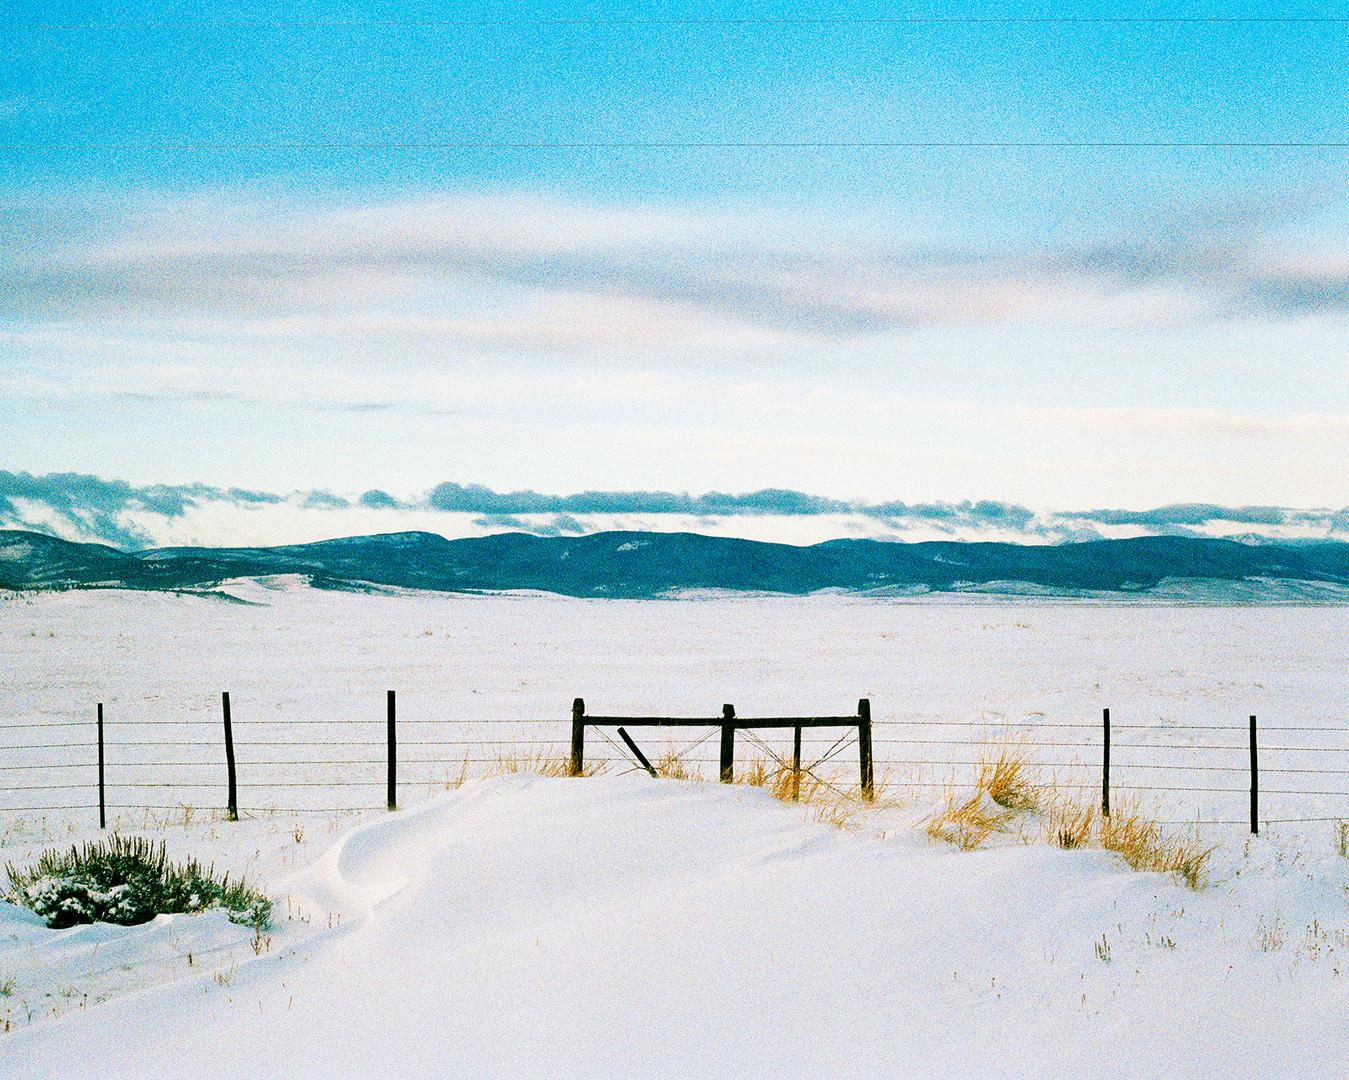 Megan Mullins Photography in Bitterroot Valley, Montana